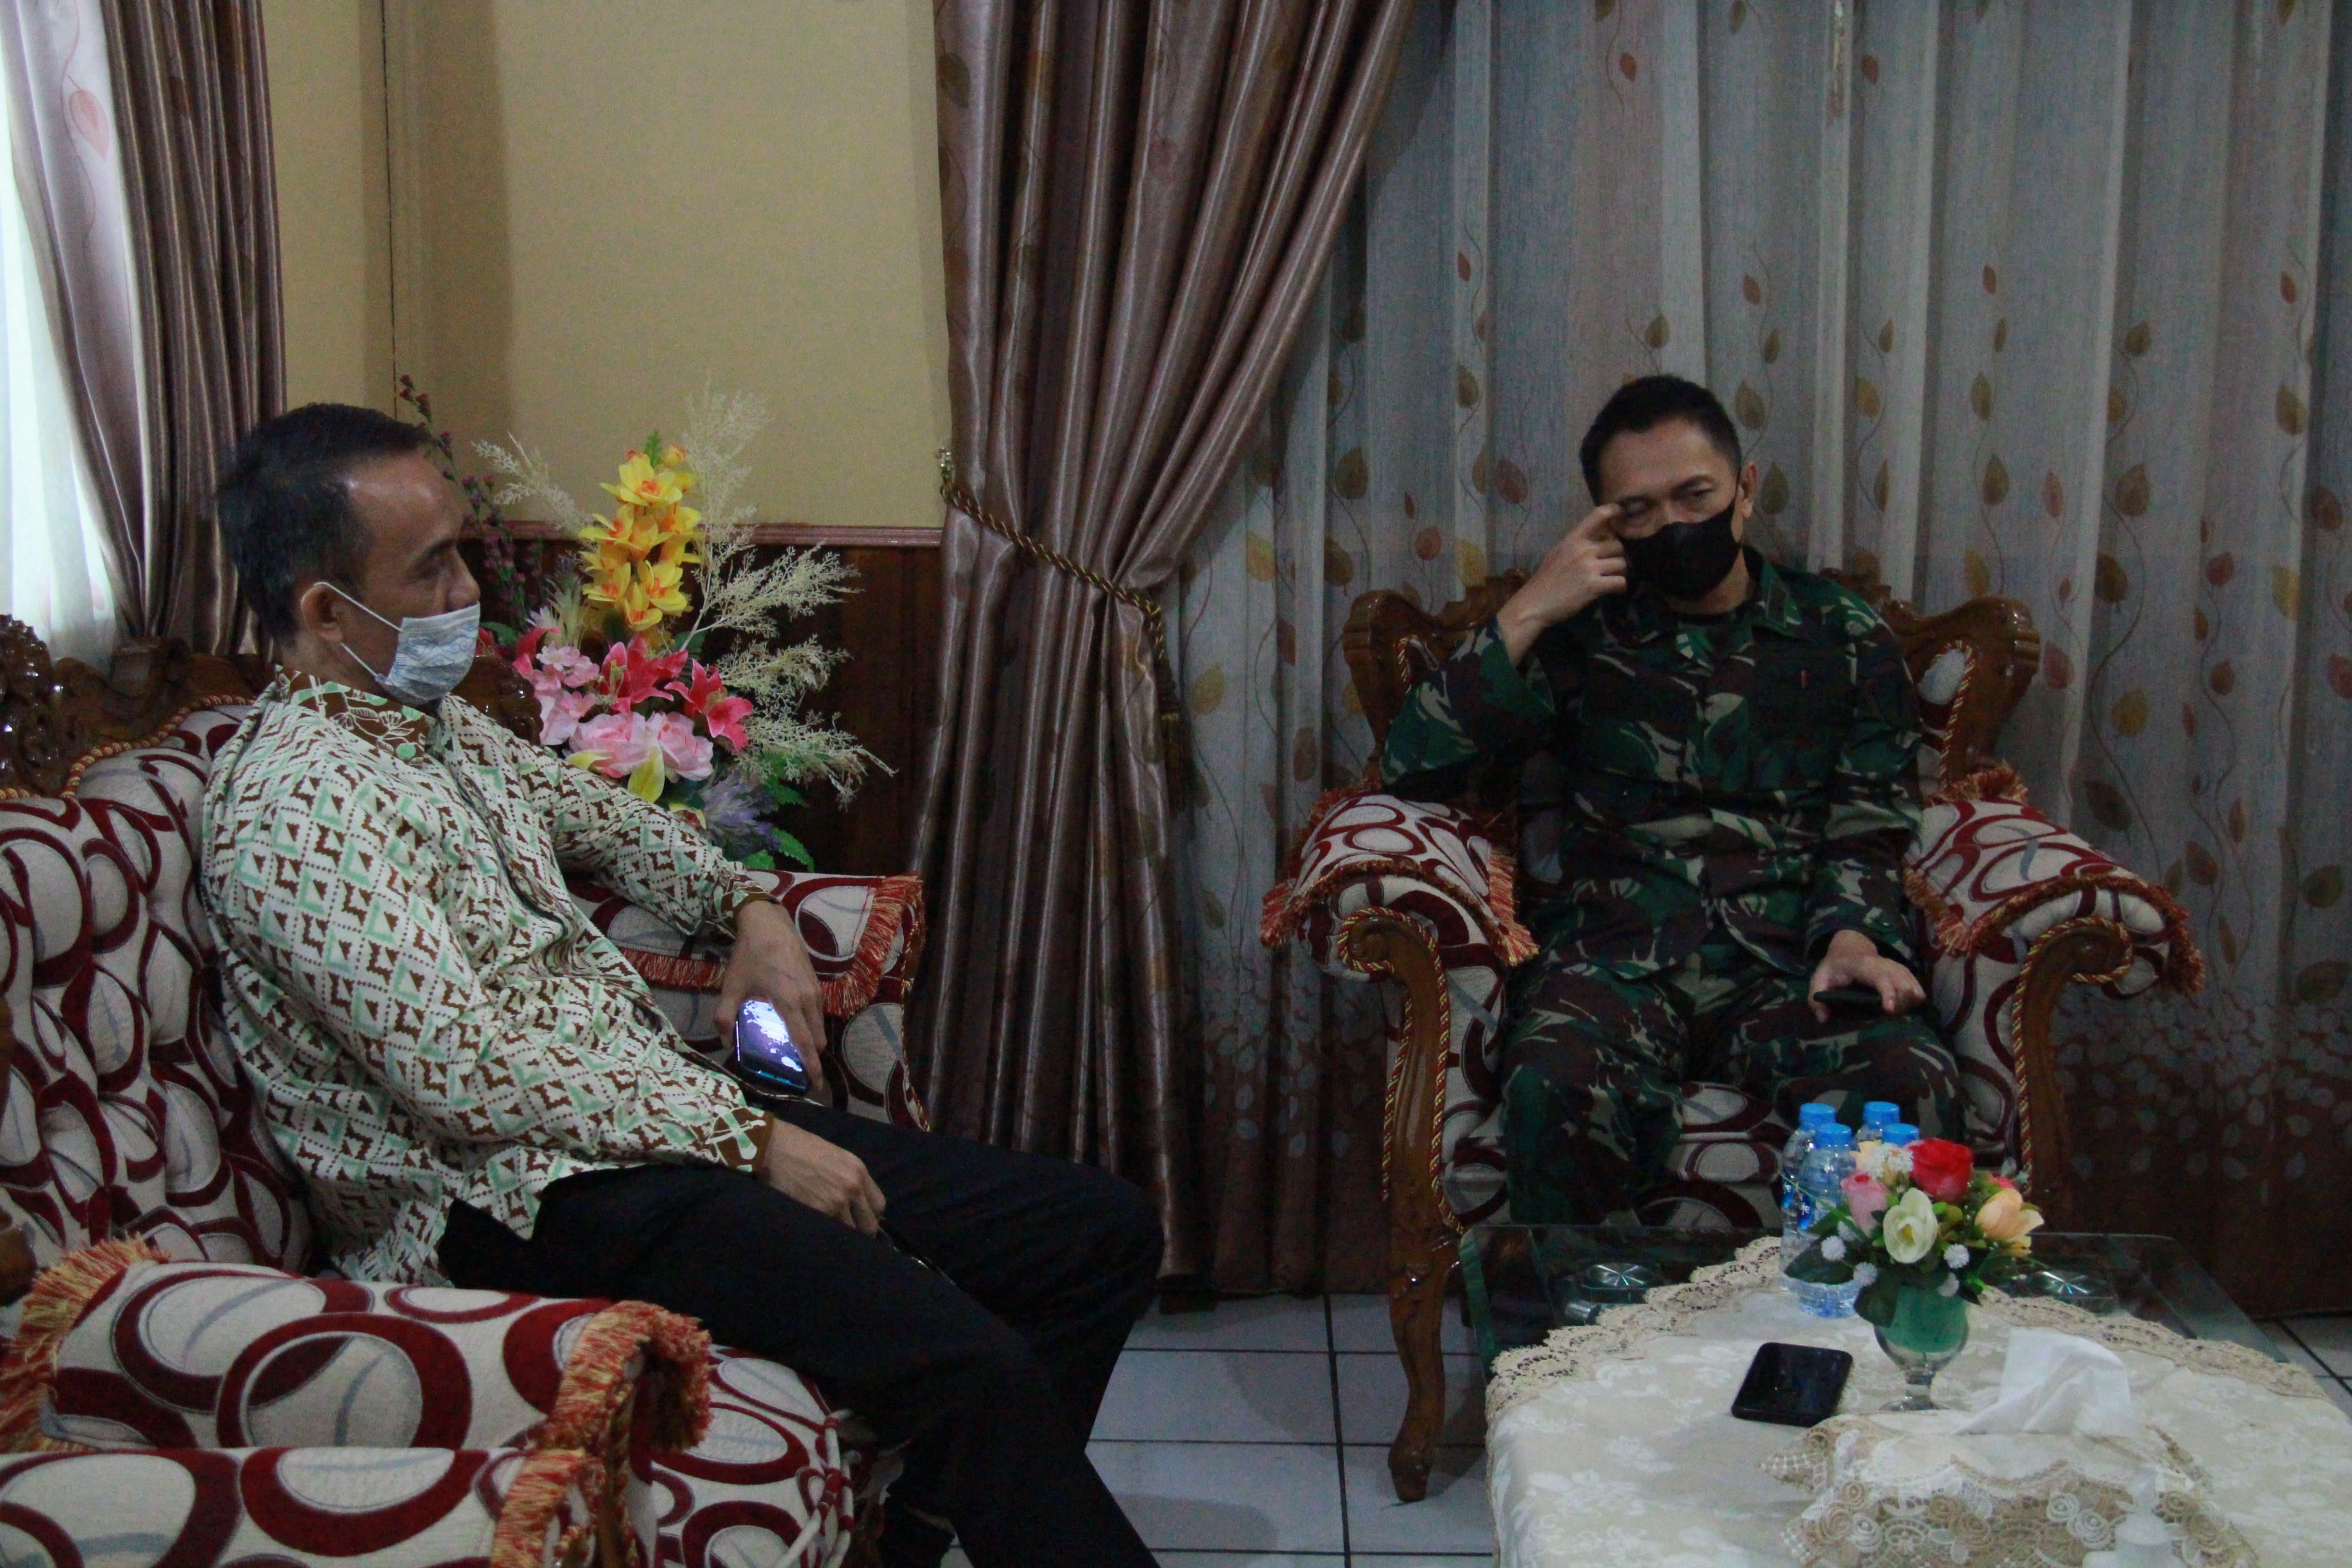 Kanwil DJKN Kalbar Dorong Optimalisasi Aset RS Kartika Husada Pontianak